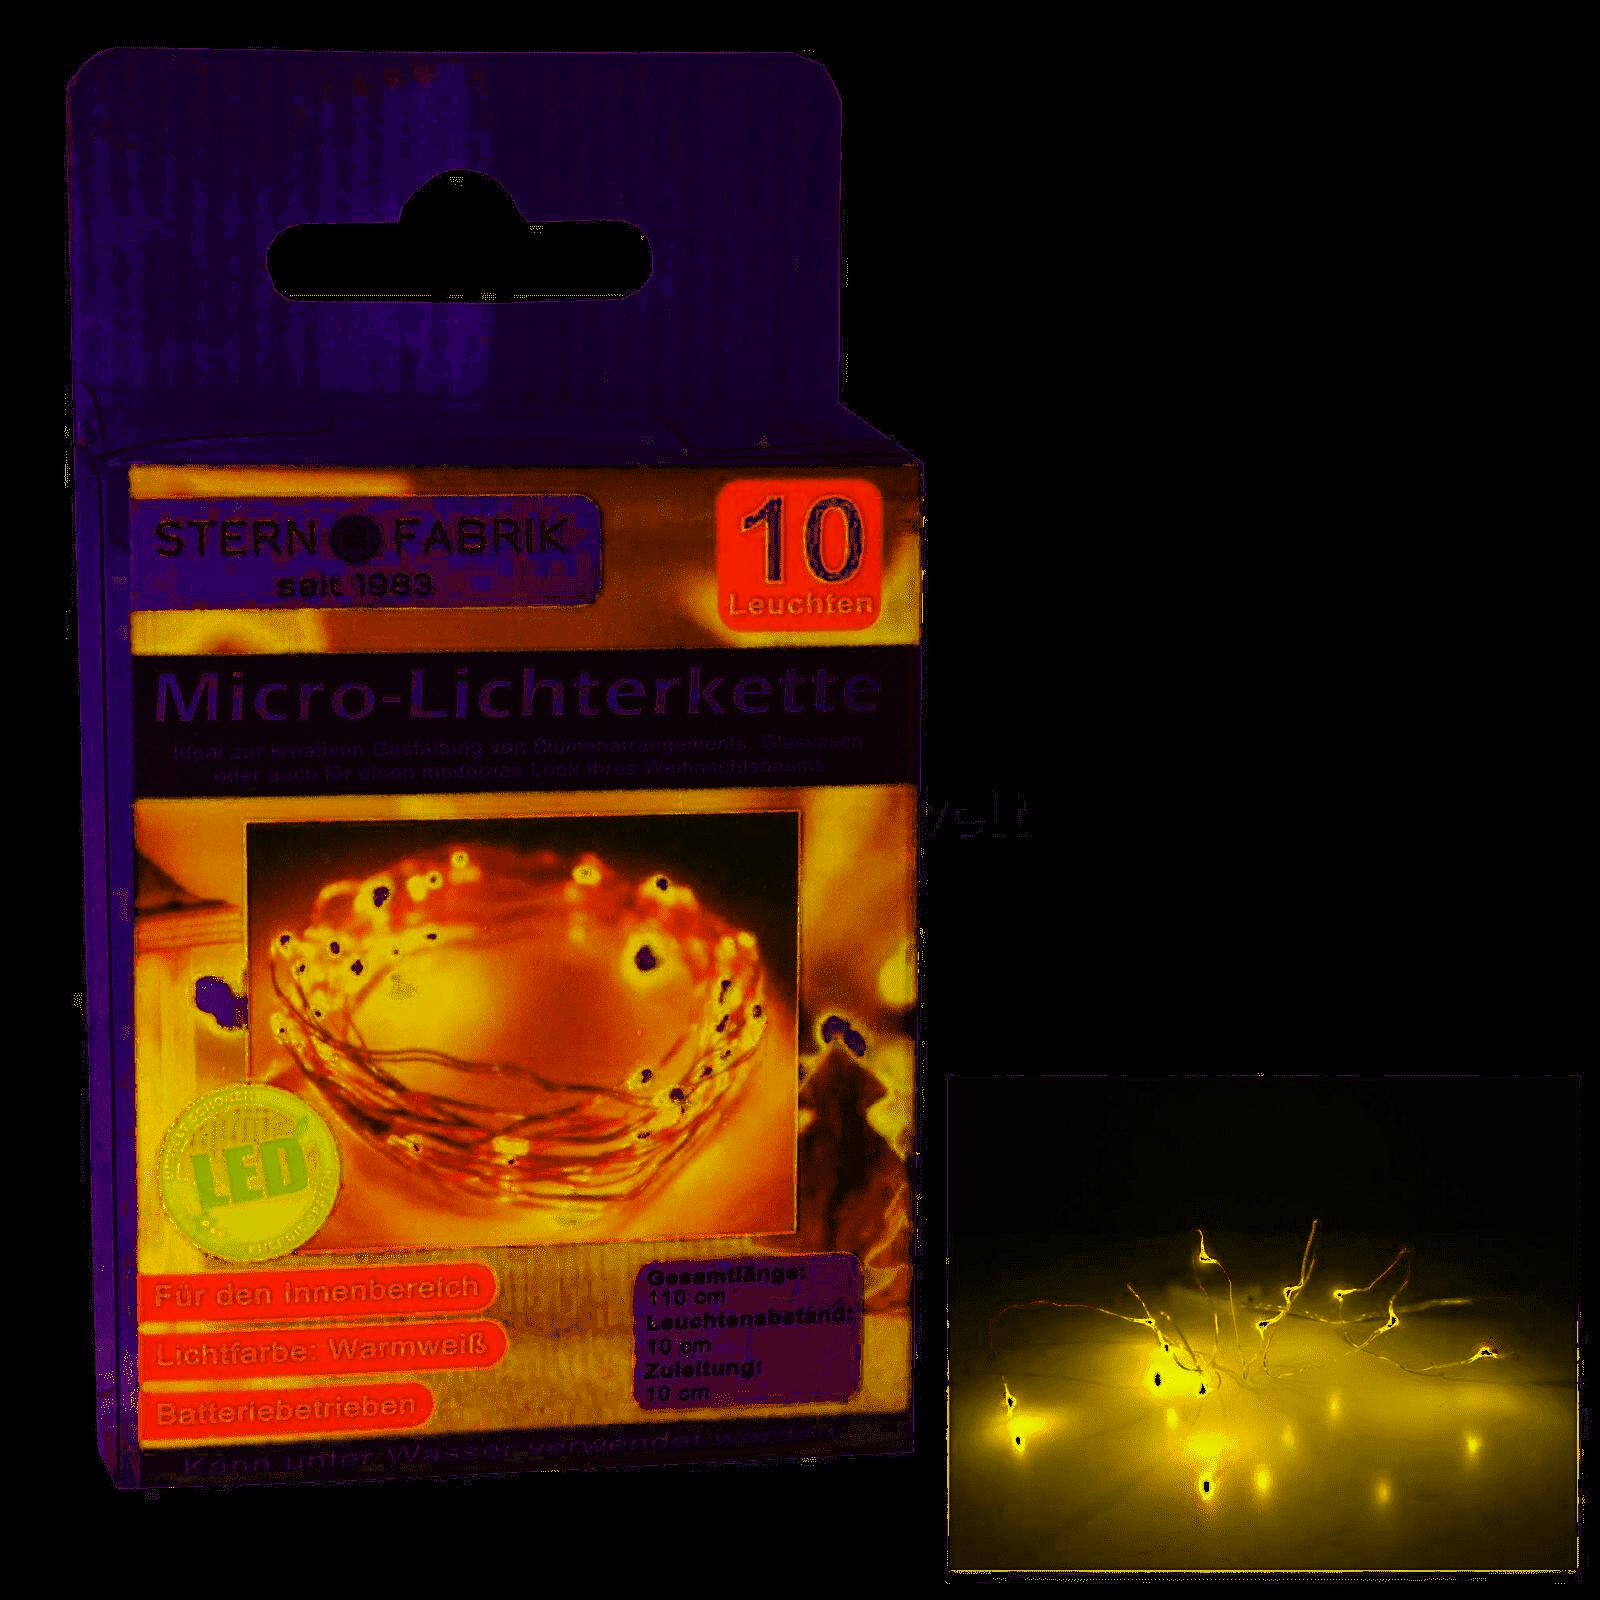 LED Lichterkette Mikro, 10 Mikro-LED 105cm warmweiß